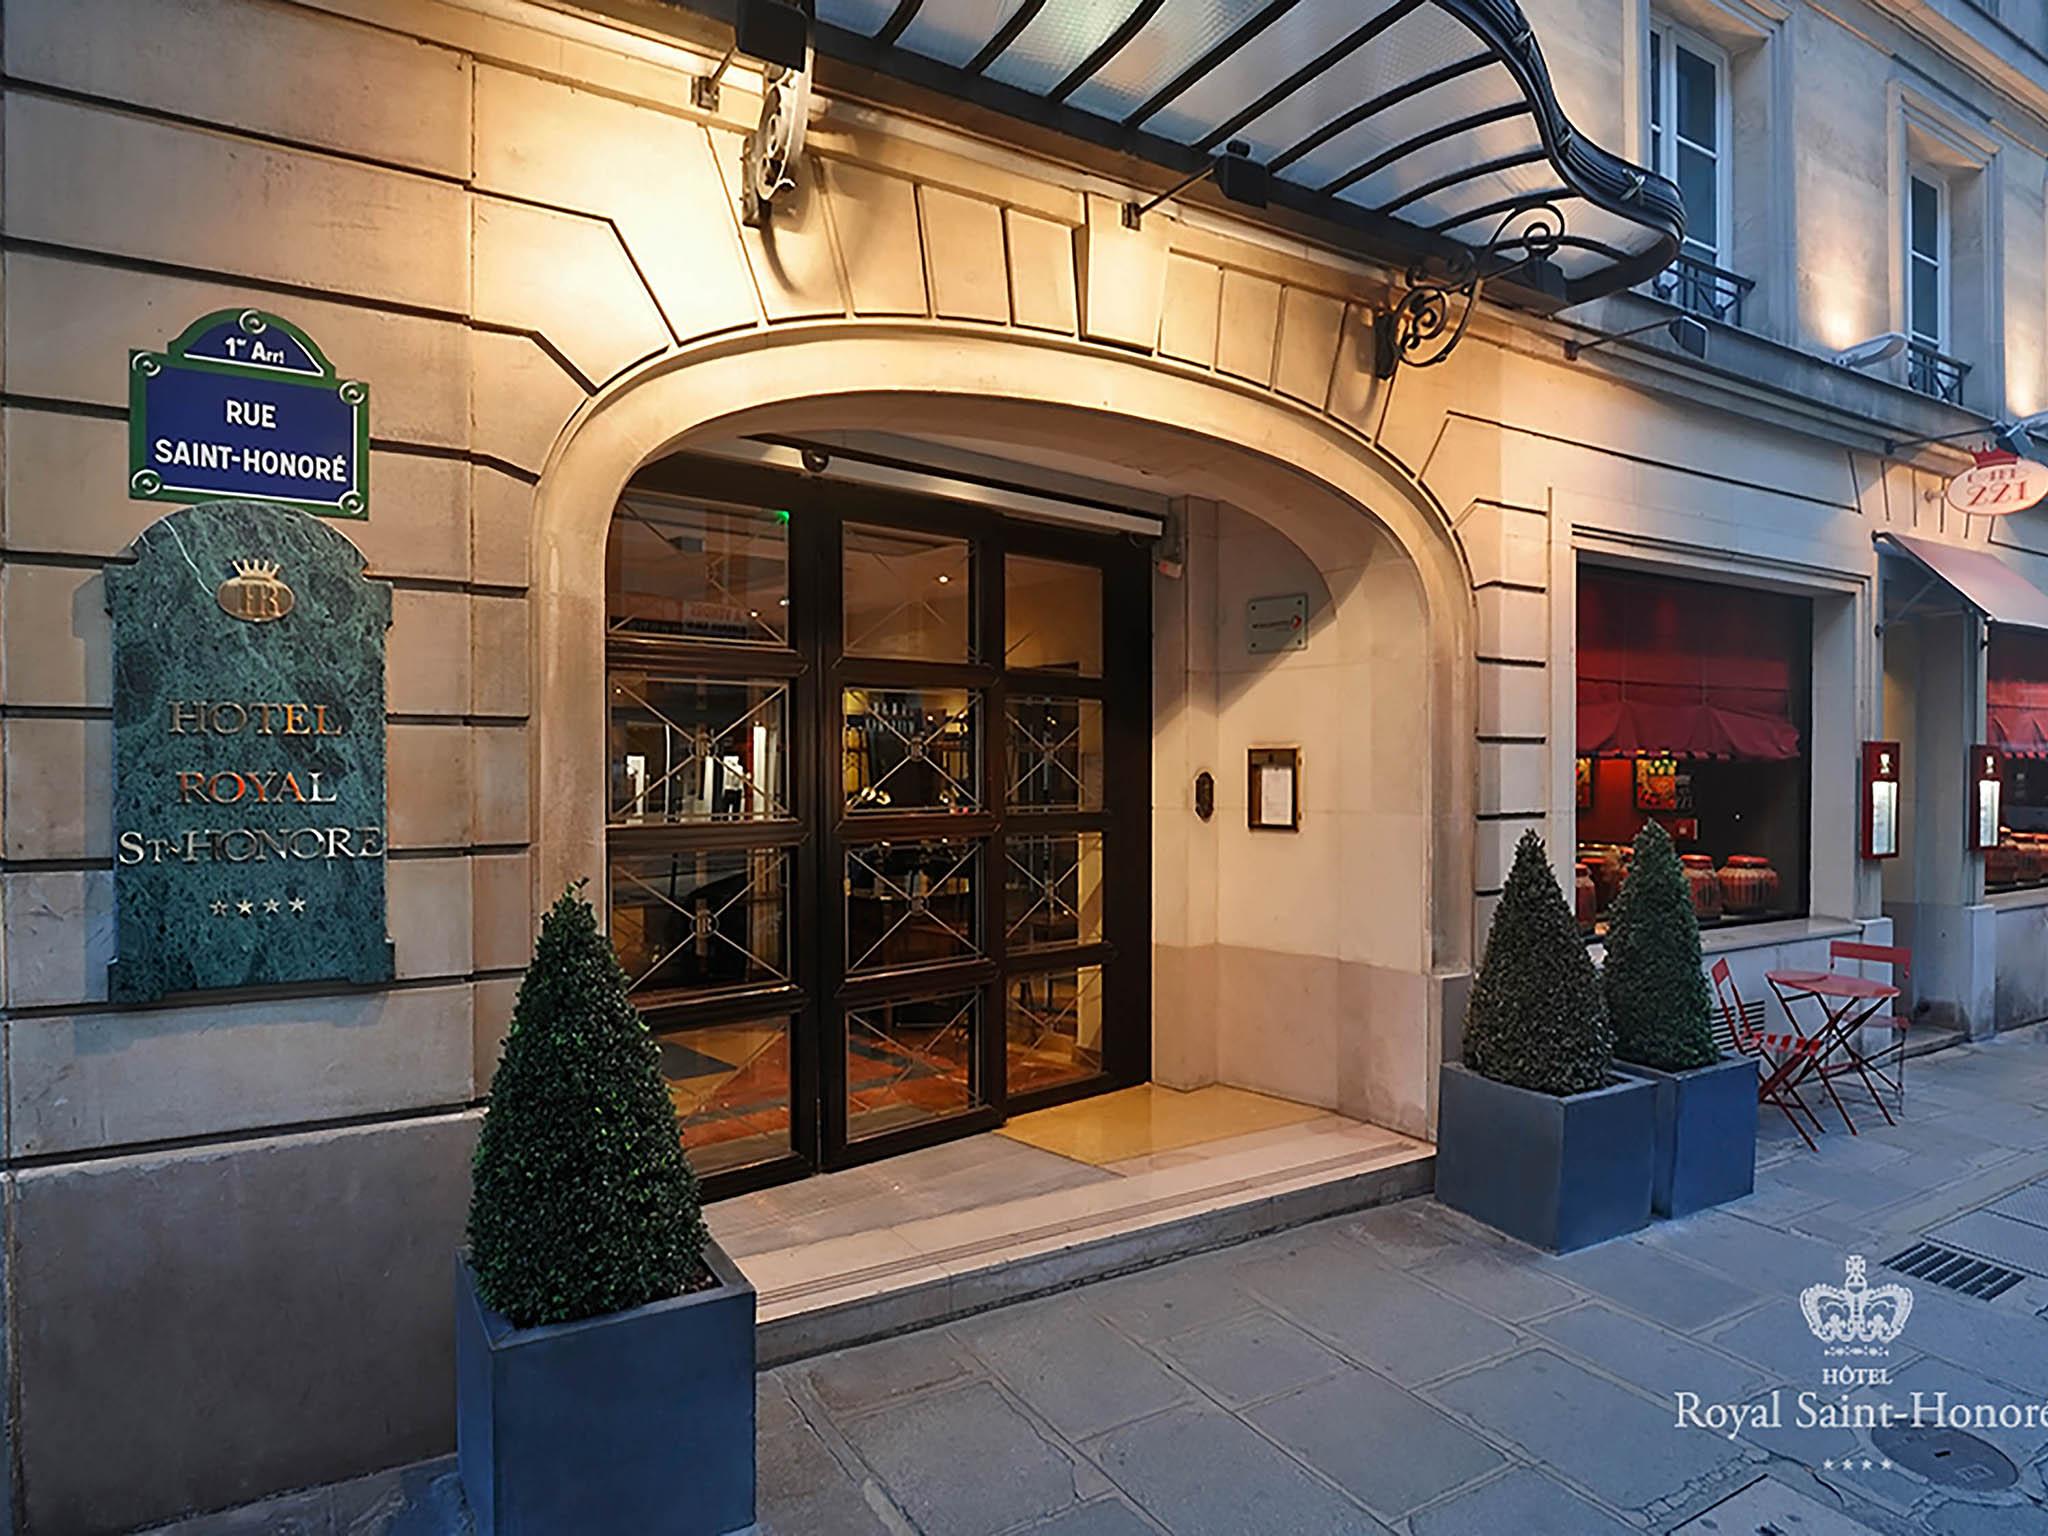 Hotel in paris royal saint honor hotel for Hotel im paris